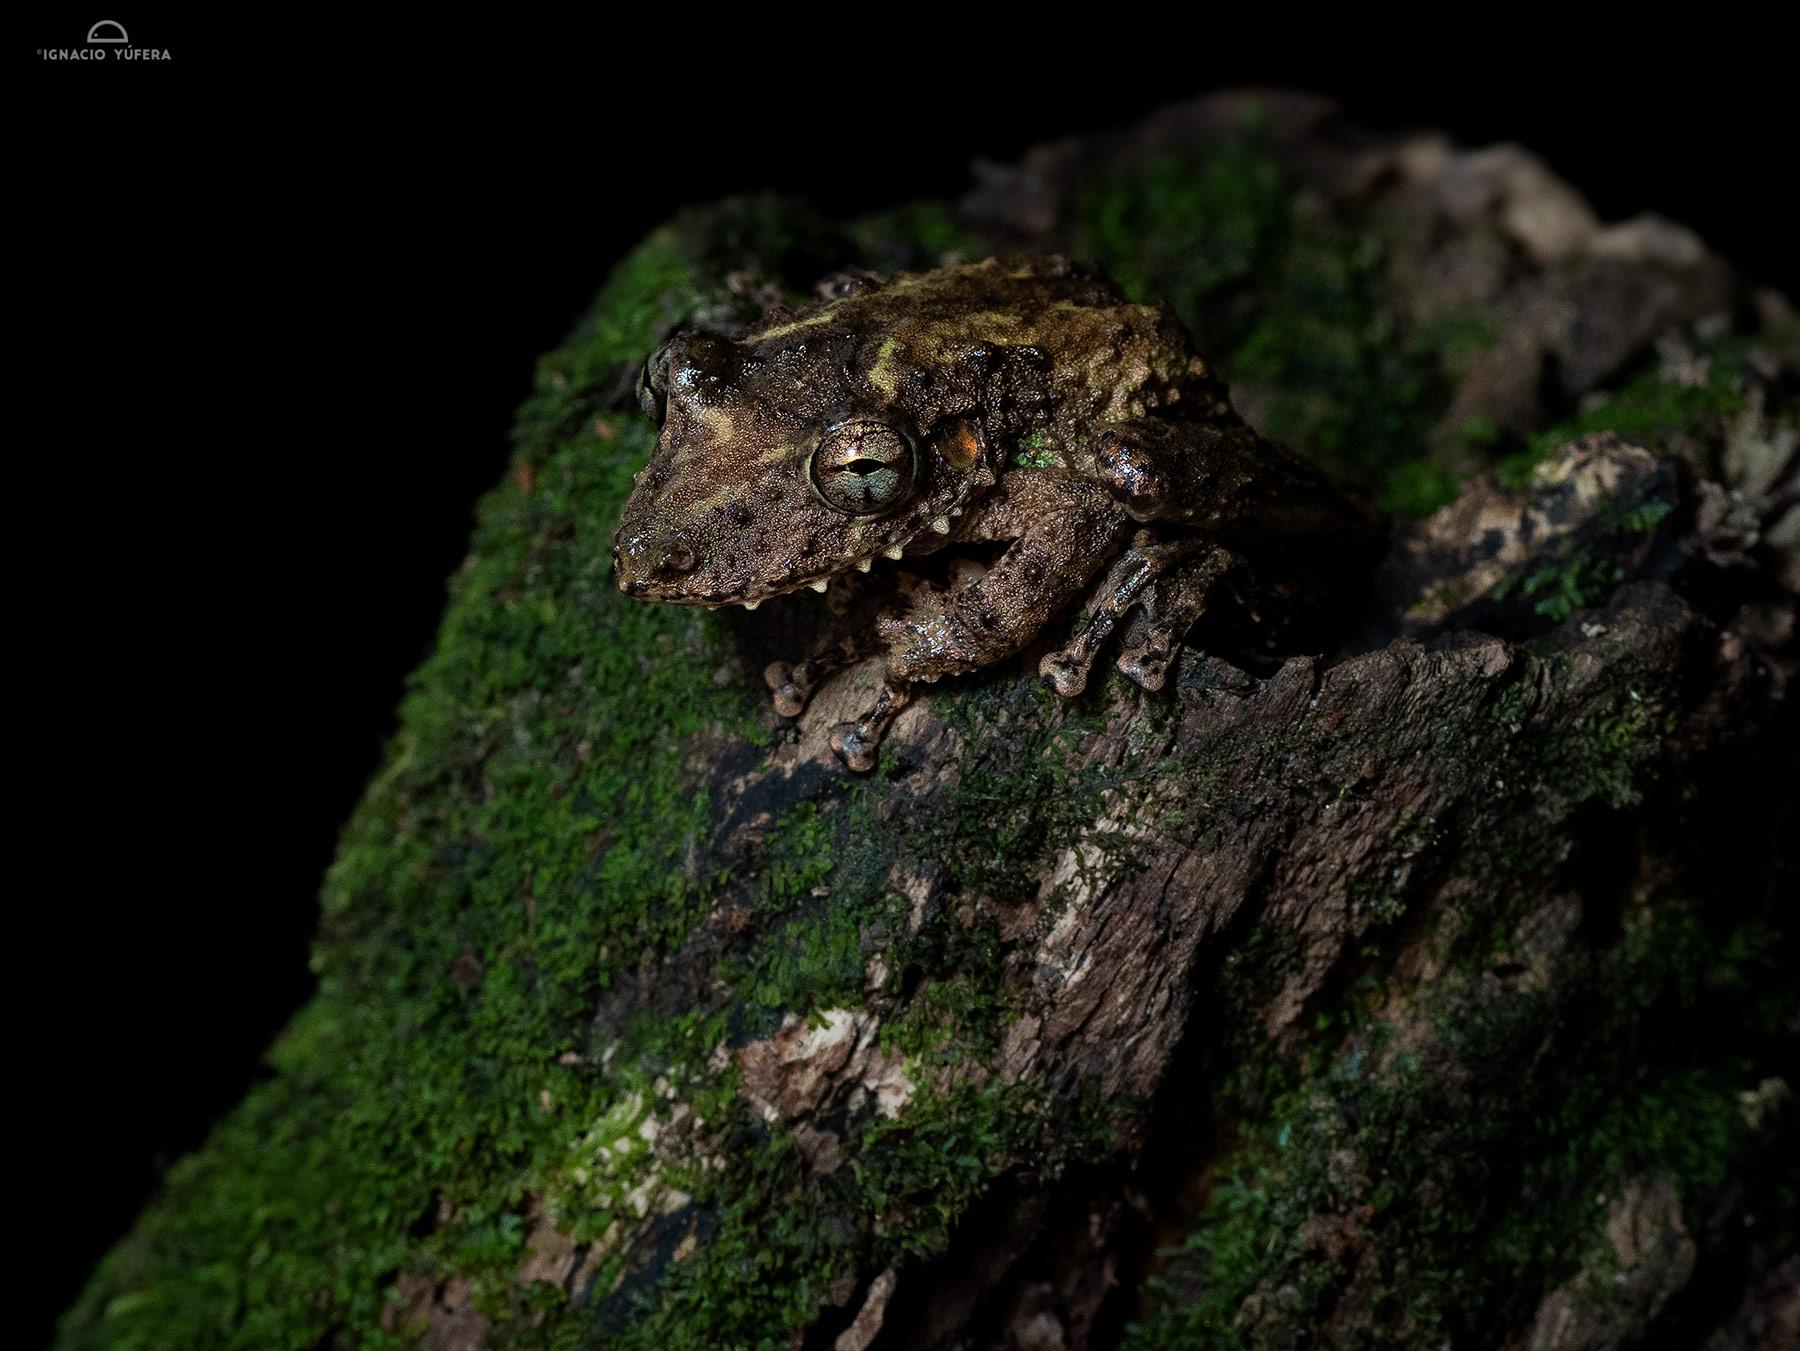 Boulenger's Long-snouted Frog (Scinax boulengeri), Costa Rica